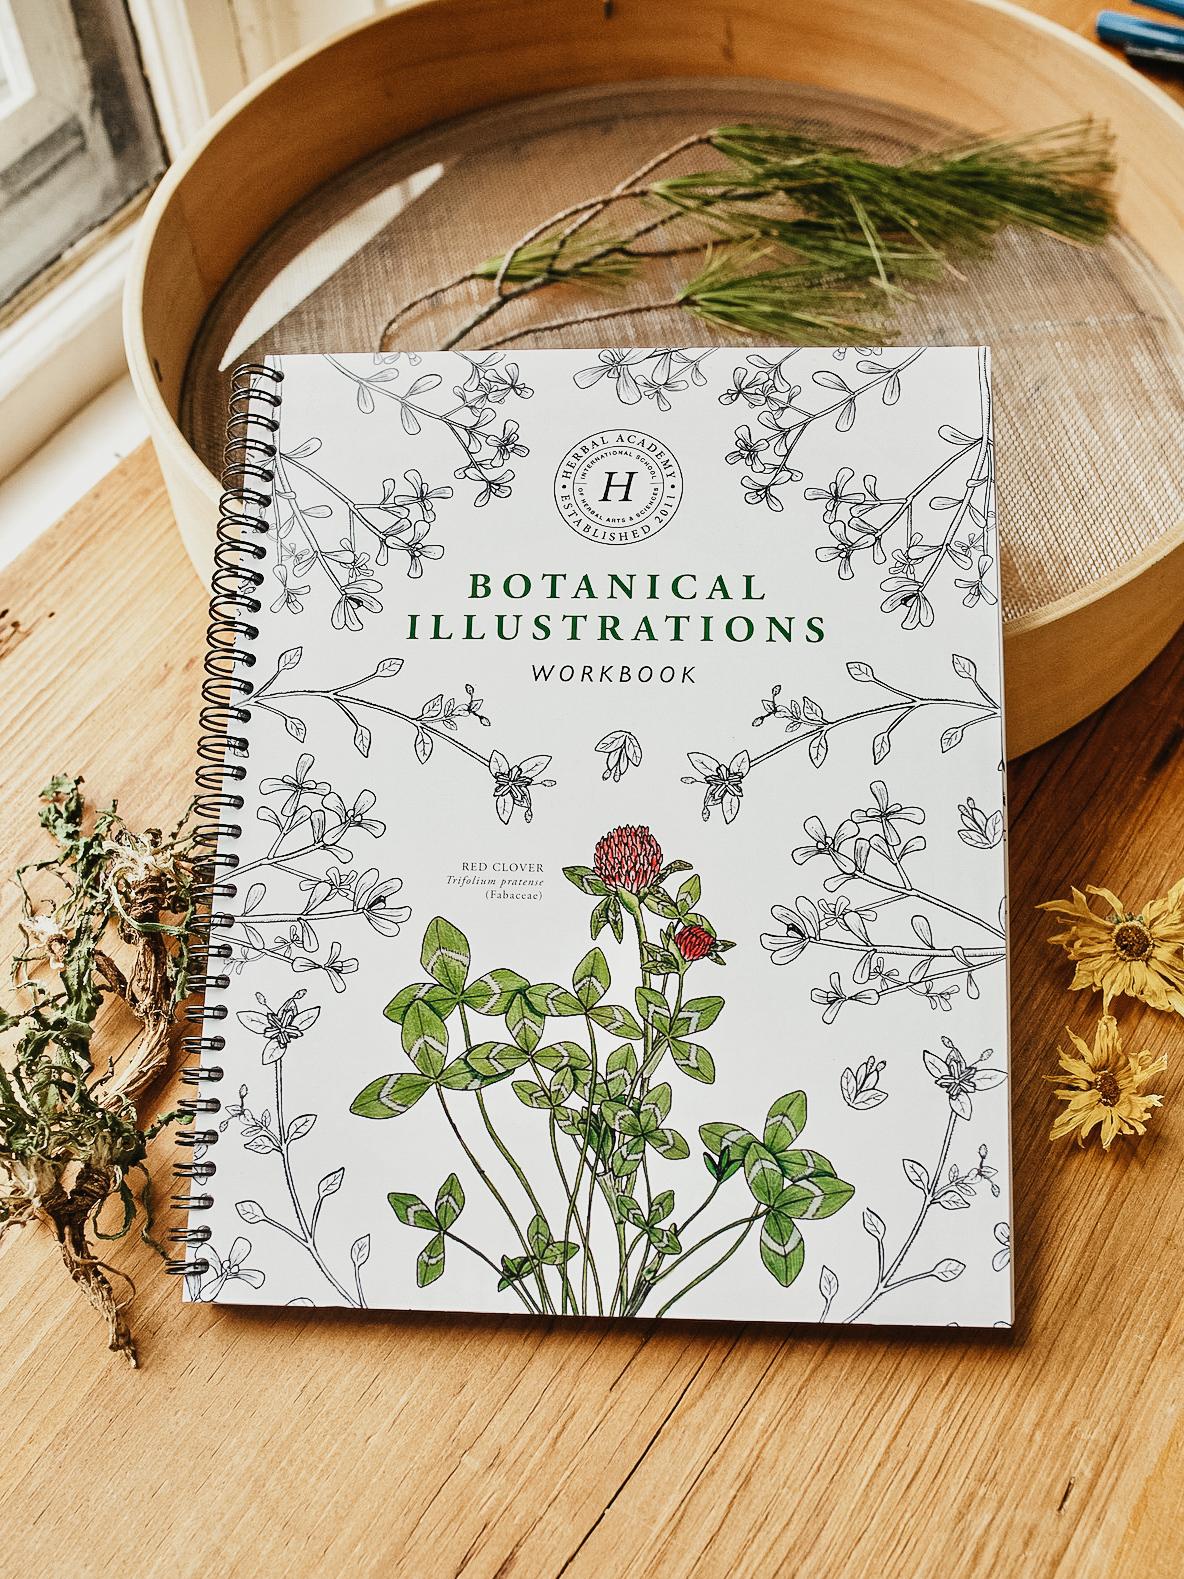 Botanical Illustrations Workbook